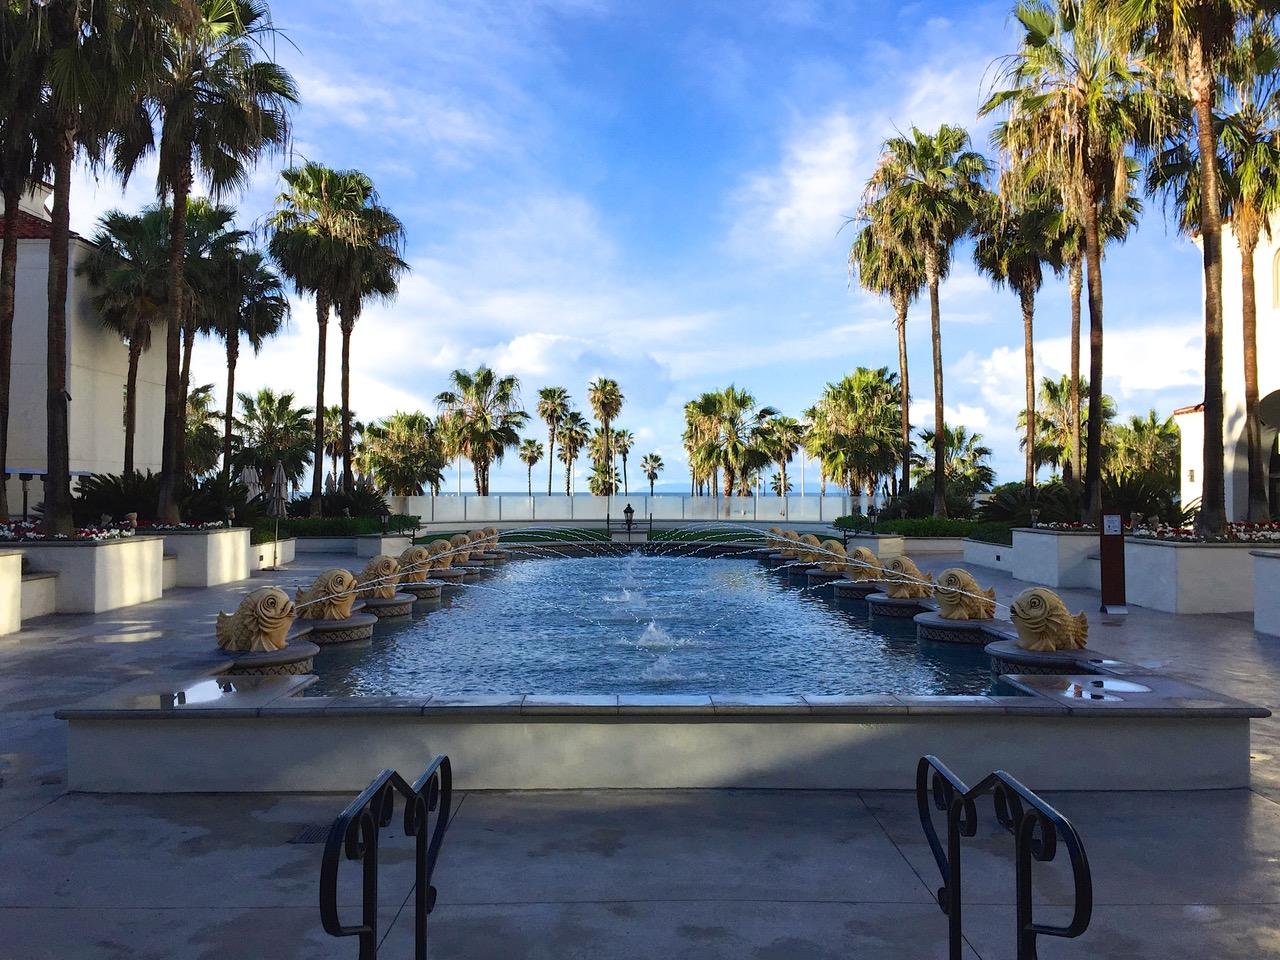 Hyatt Regency pool - Huntington Beach, USA